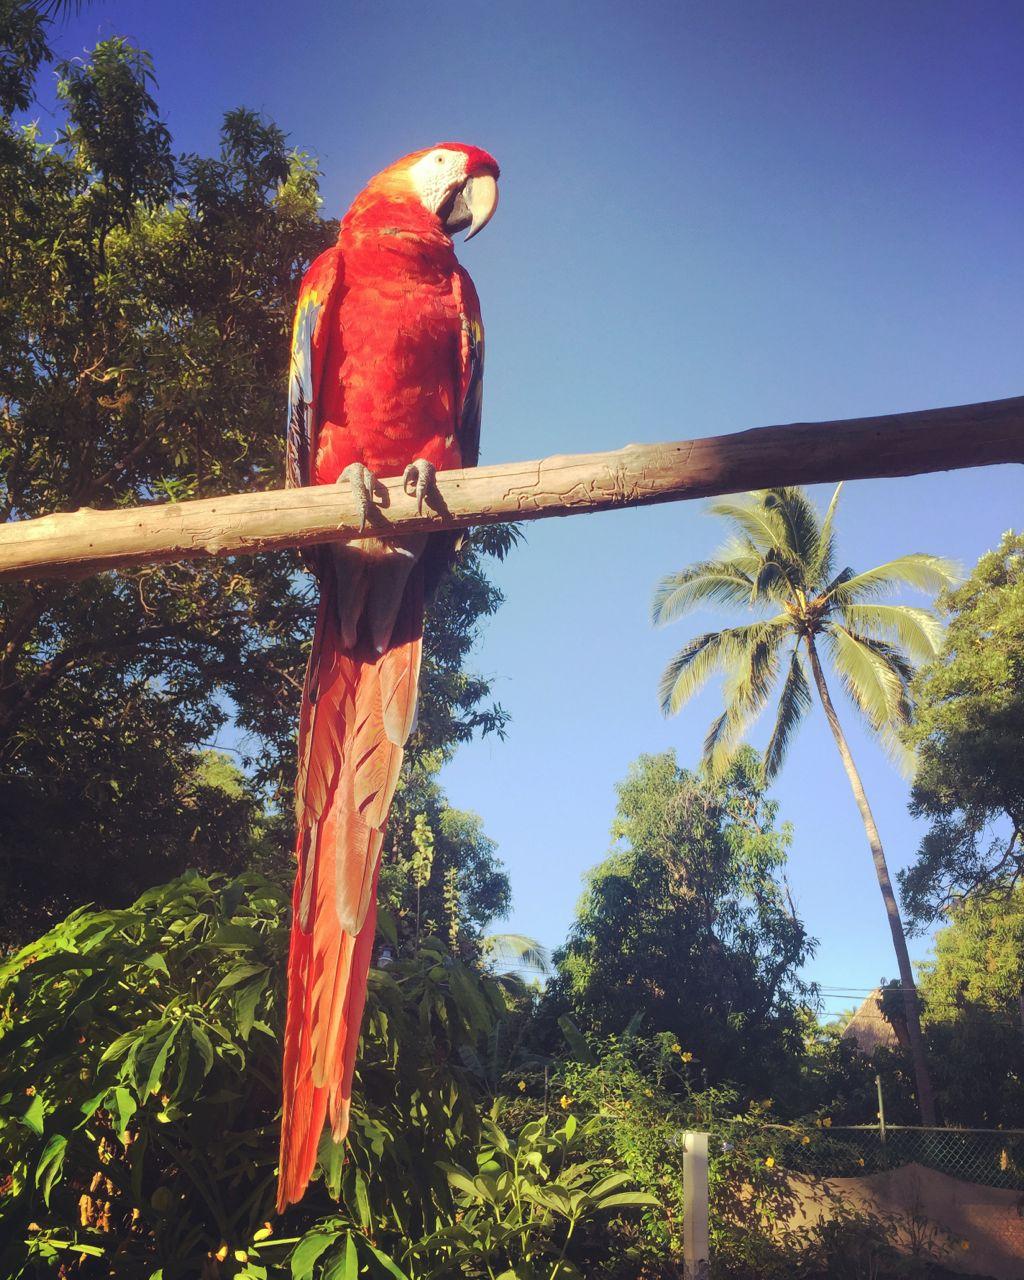 One of the noisy papagayos from Saburo's place